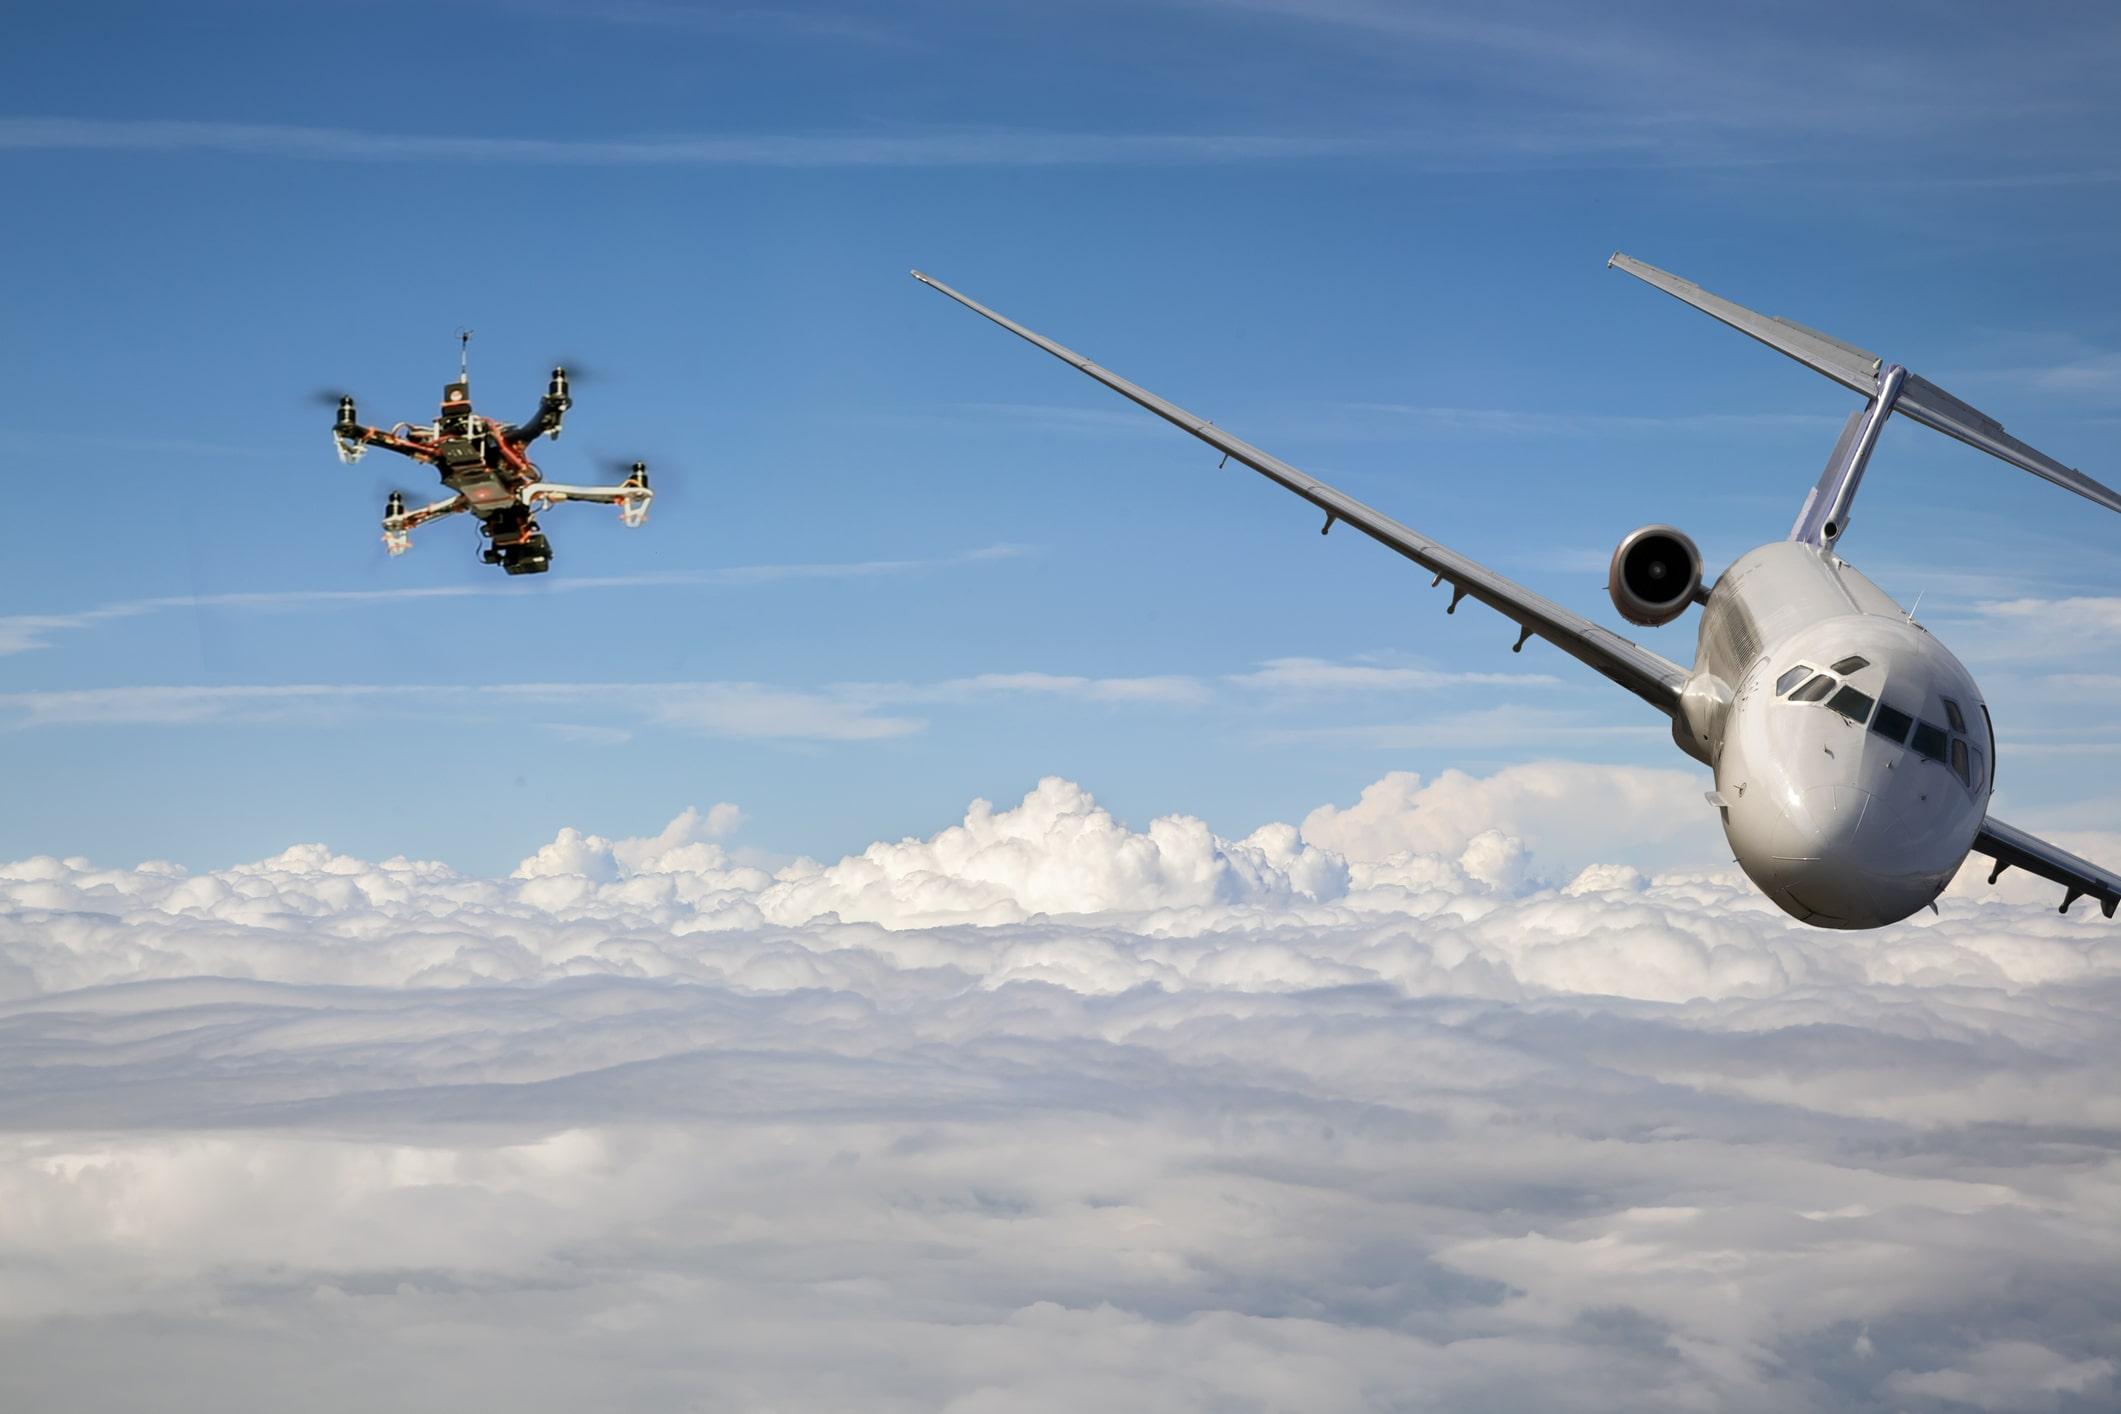 drone strike airplane image